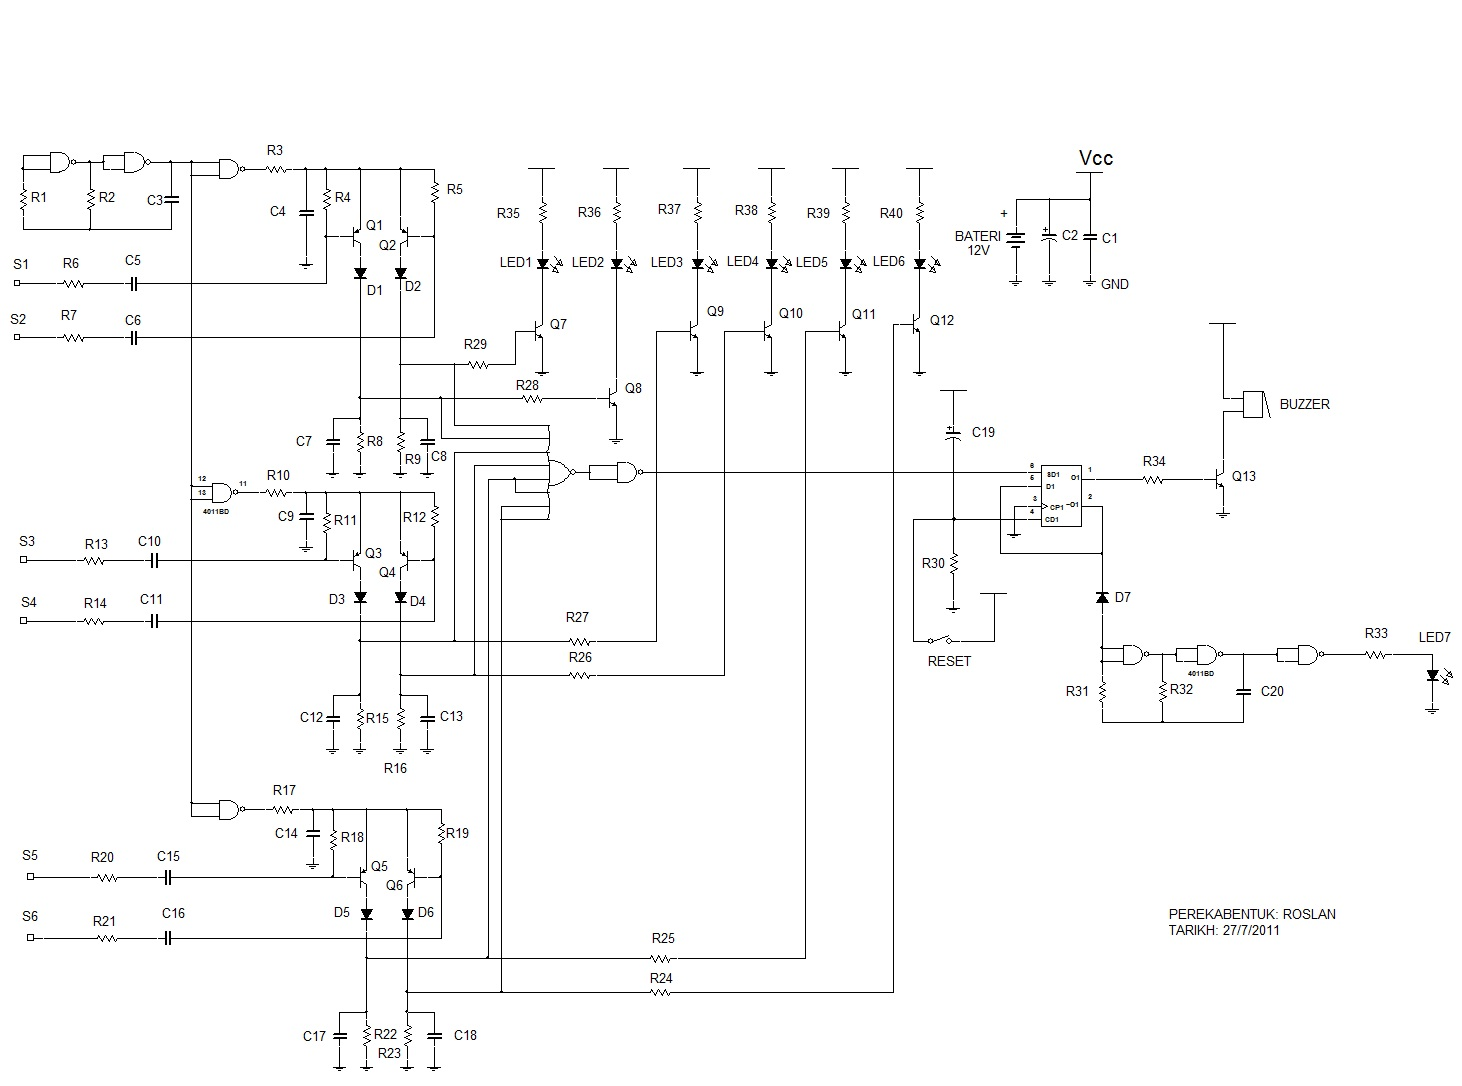 Projek Elektronik Projek Projek Elektronik Elektronik Projek Elektronik 2011